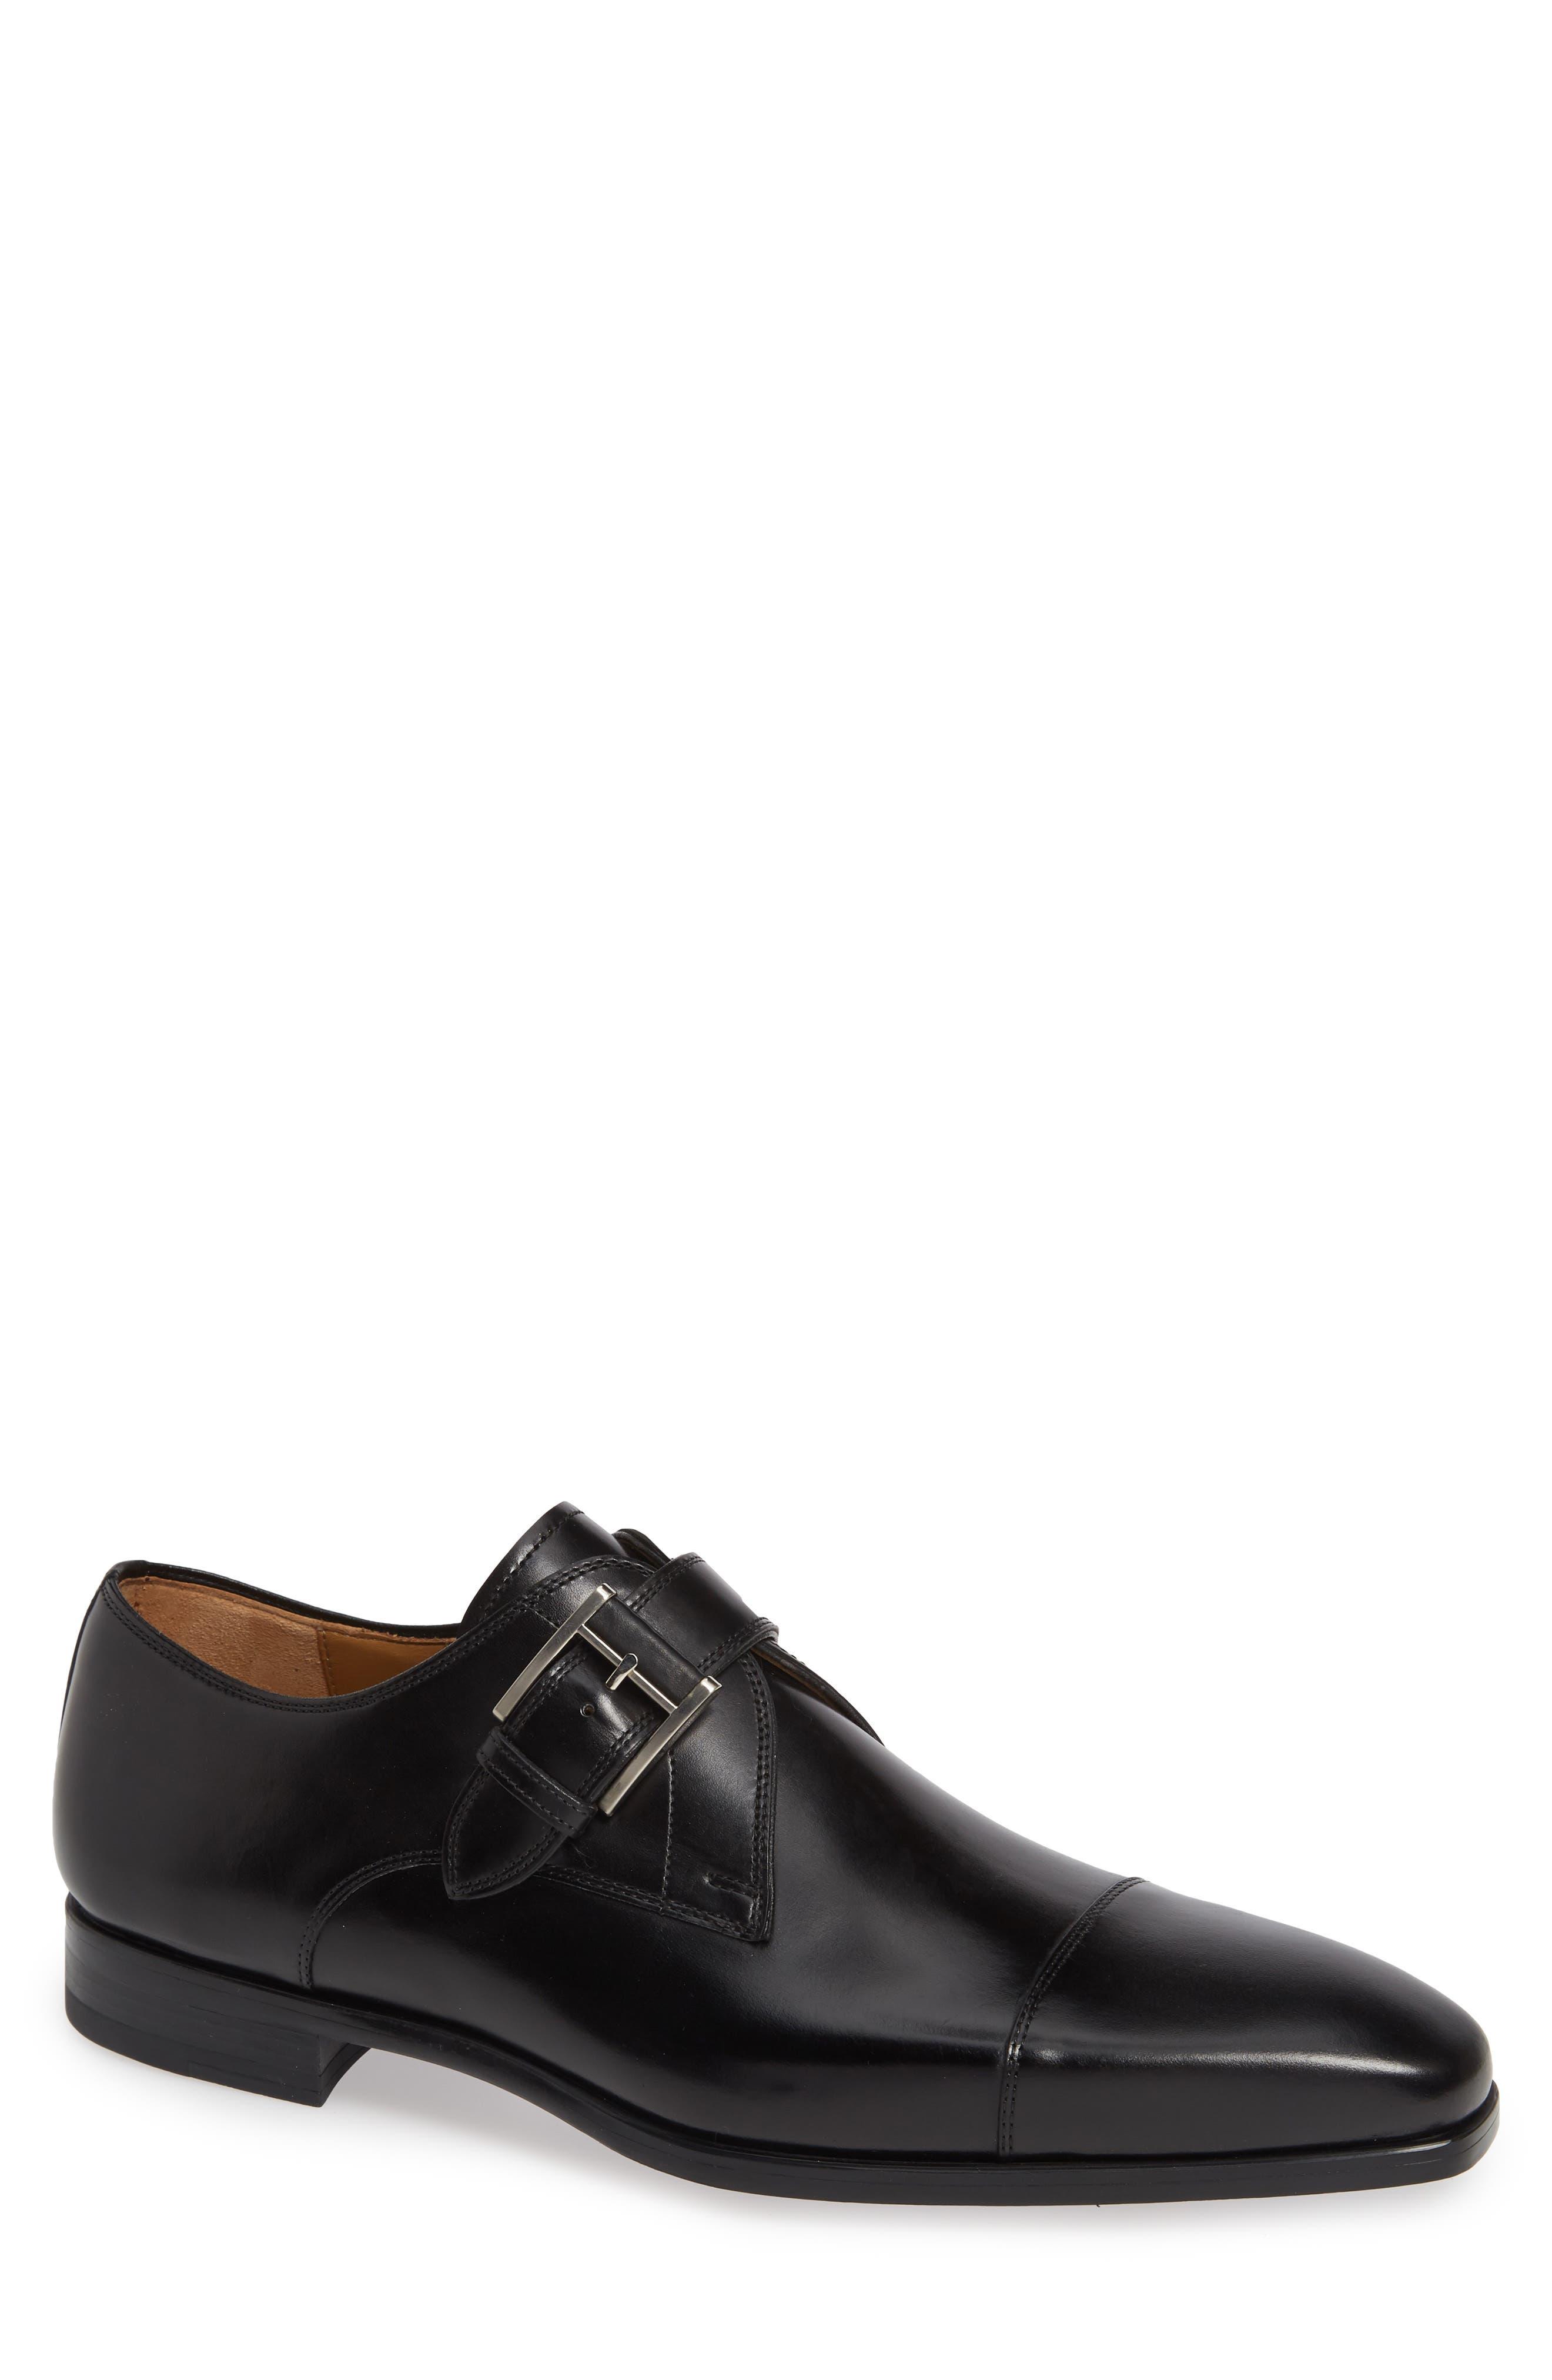 Patricio Monk Strap Shoe,                         Main,                         color, BLACK LEATHER